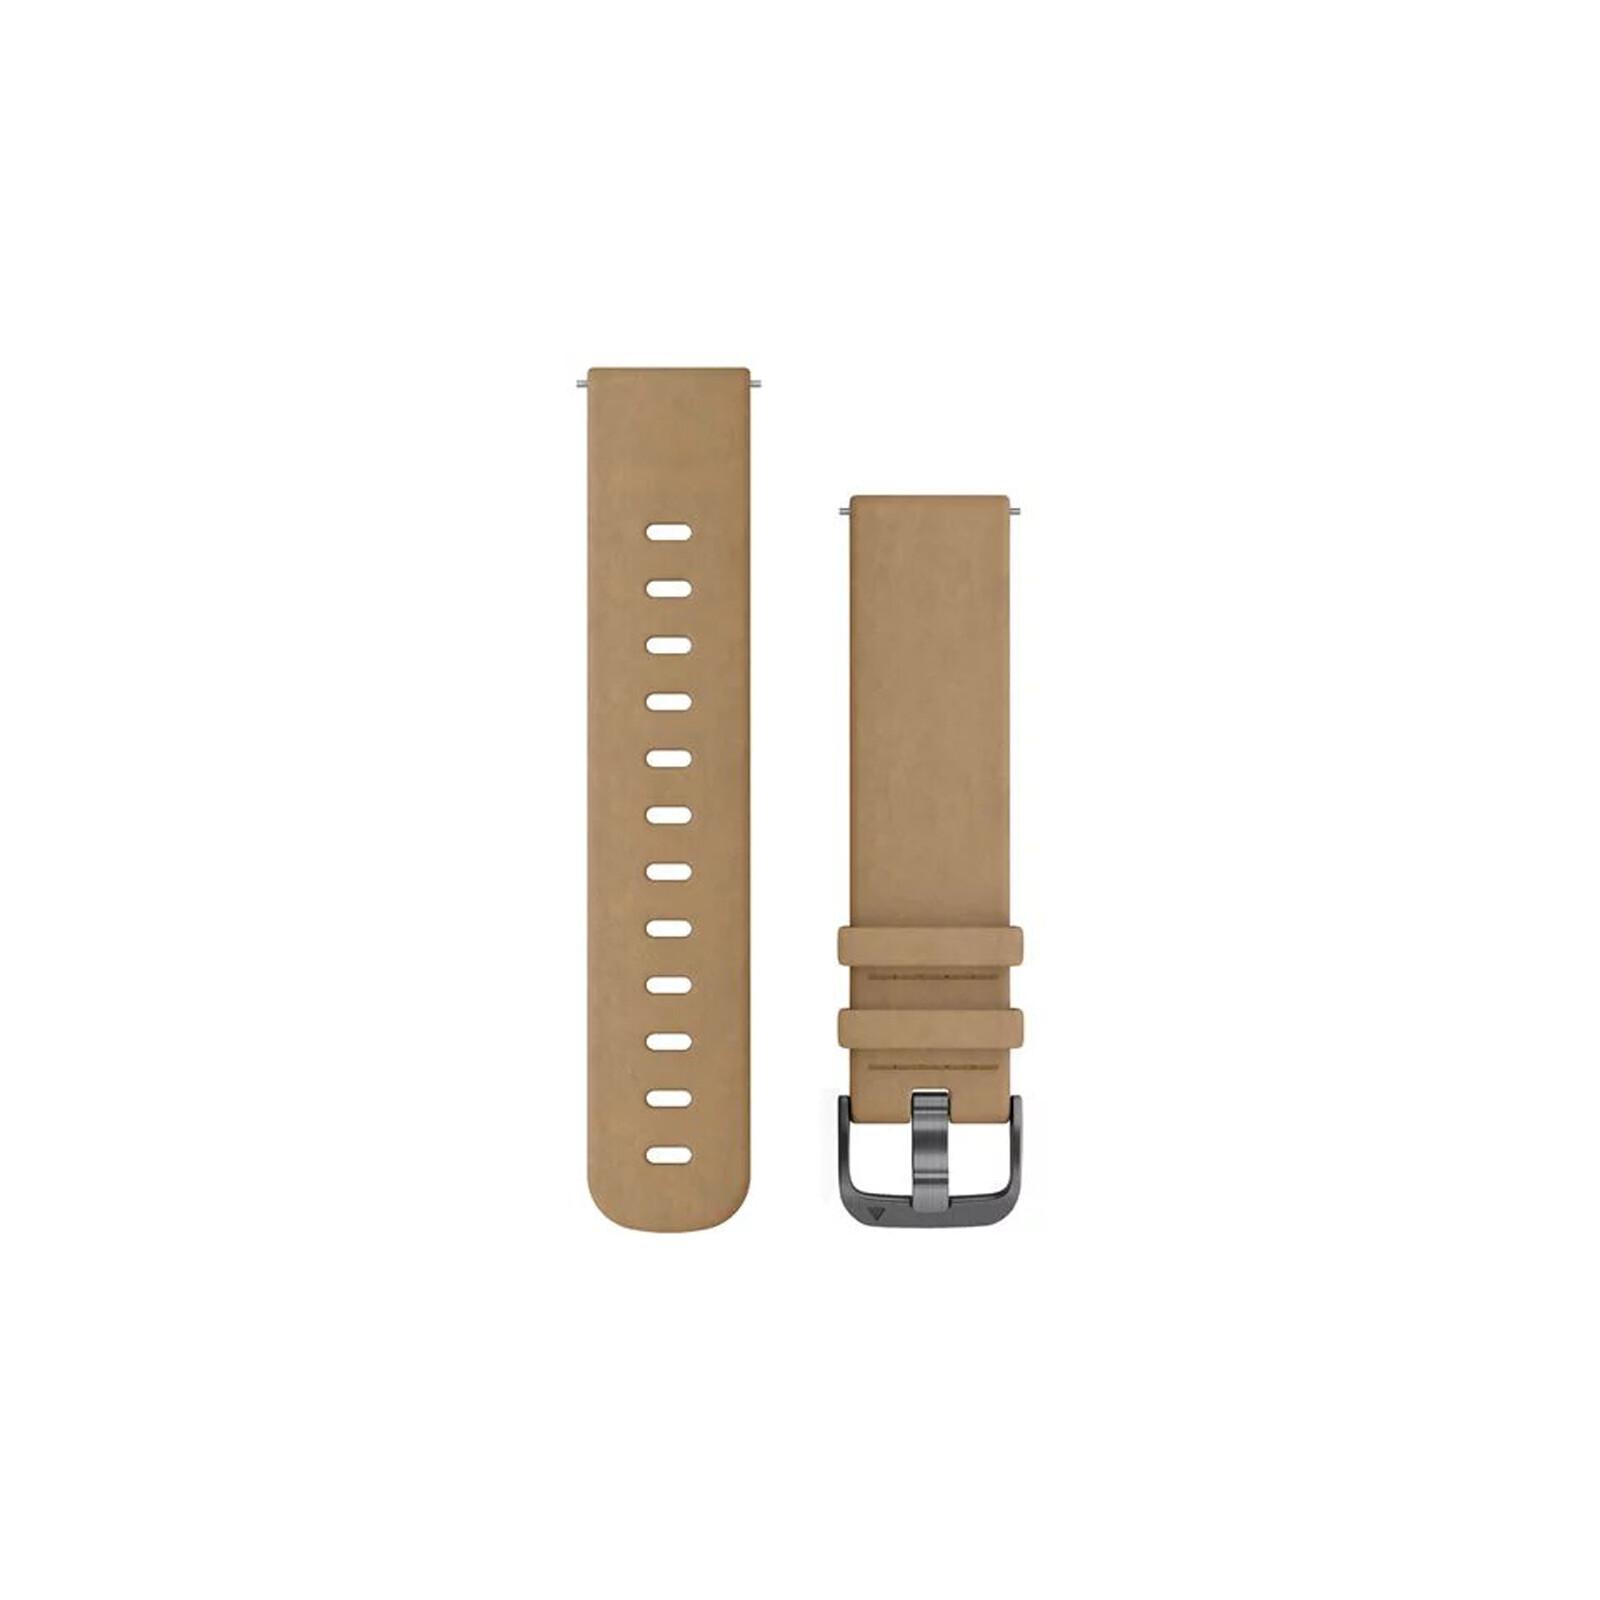 Garmin Uhrenarmband Vivomove 20mm Leder Schiefer